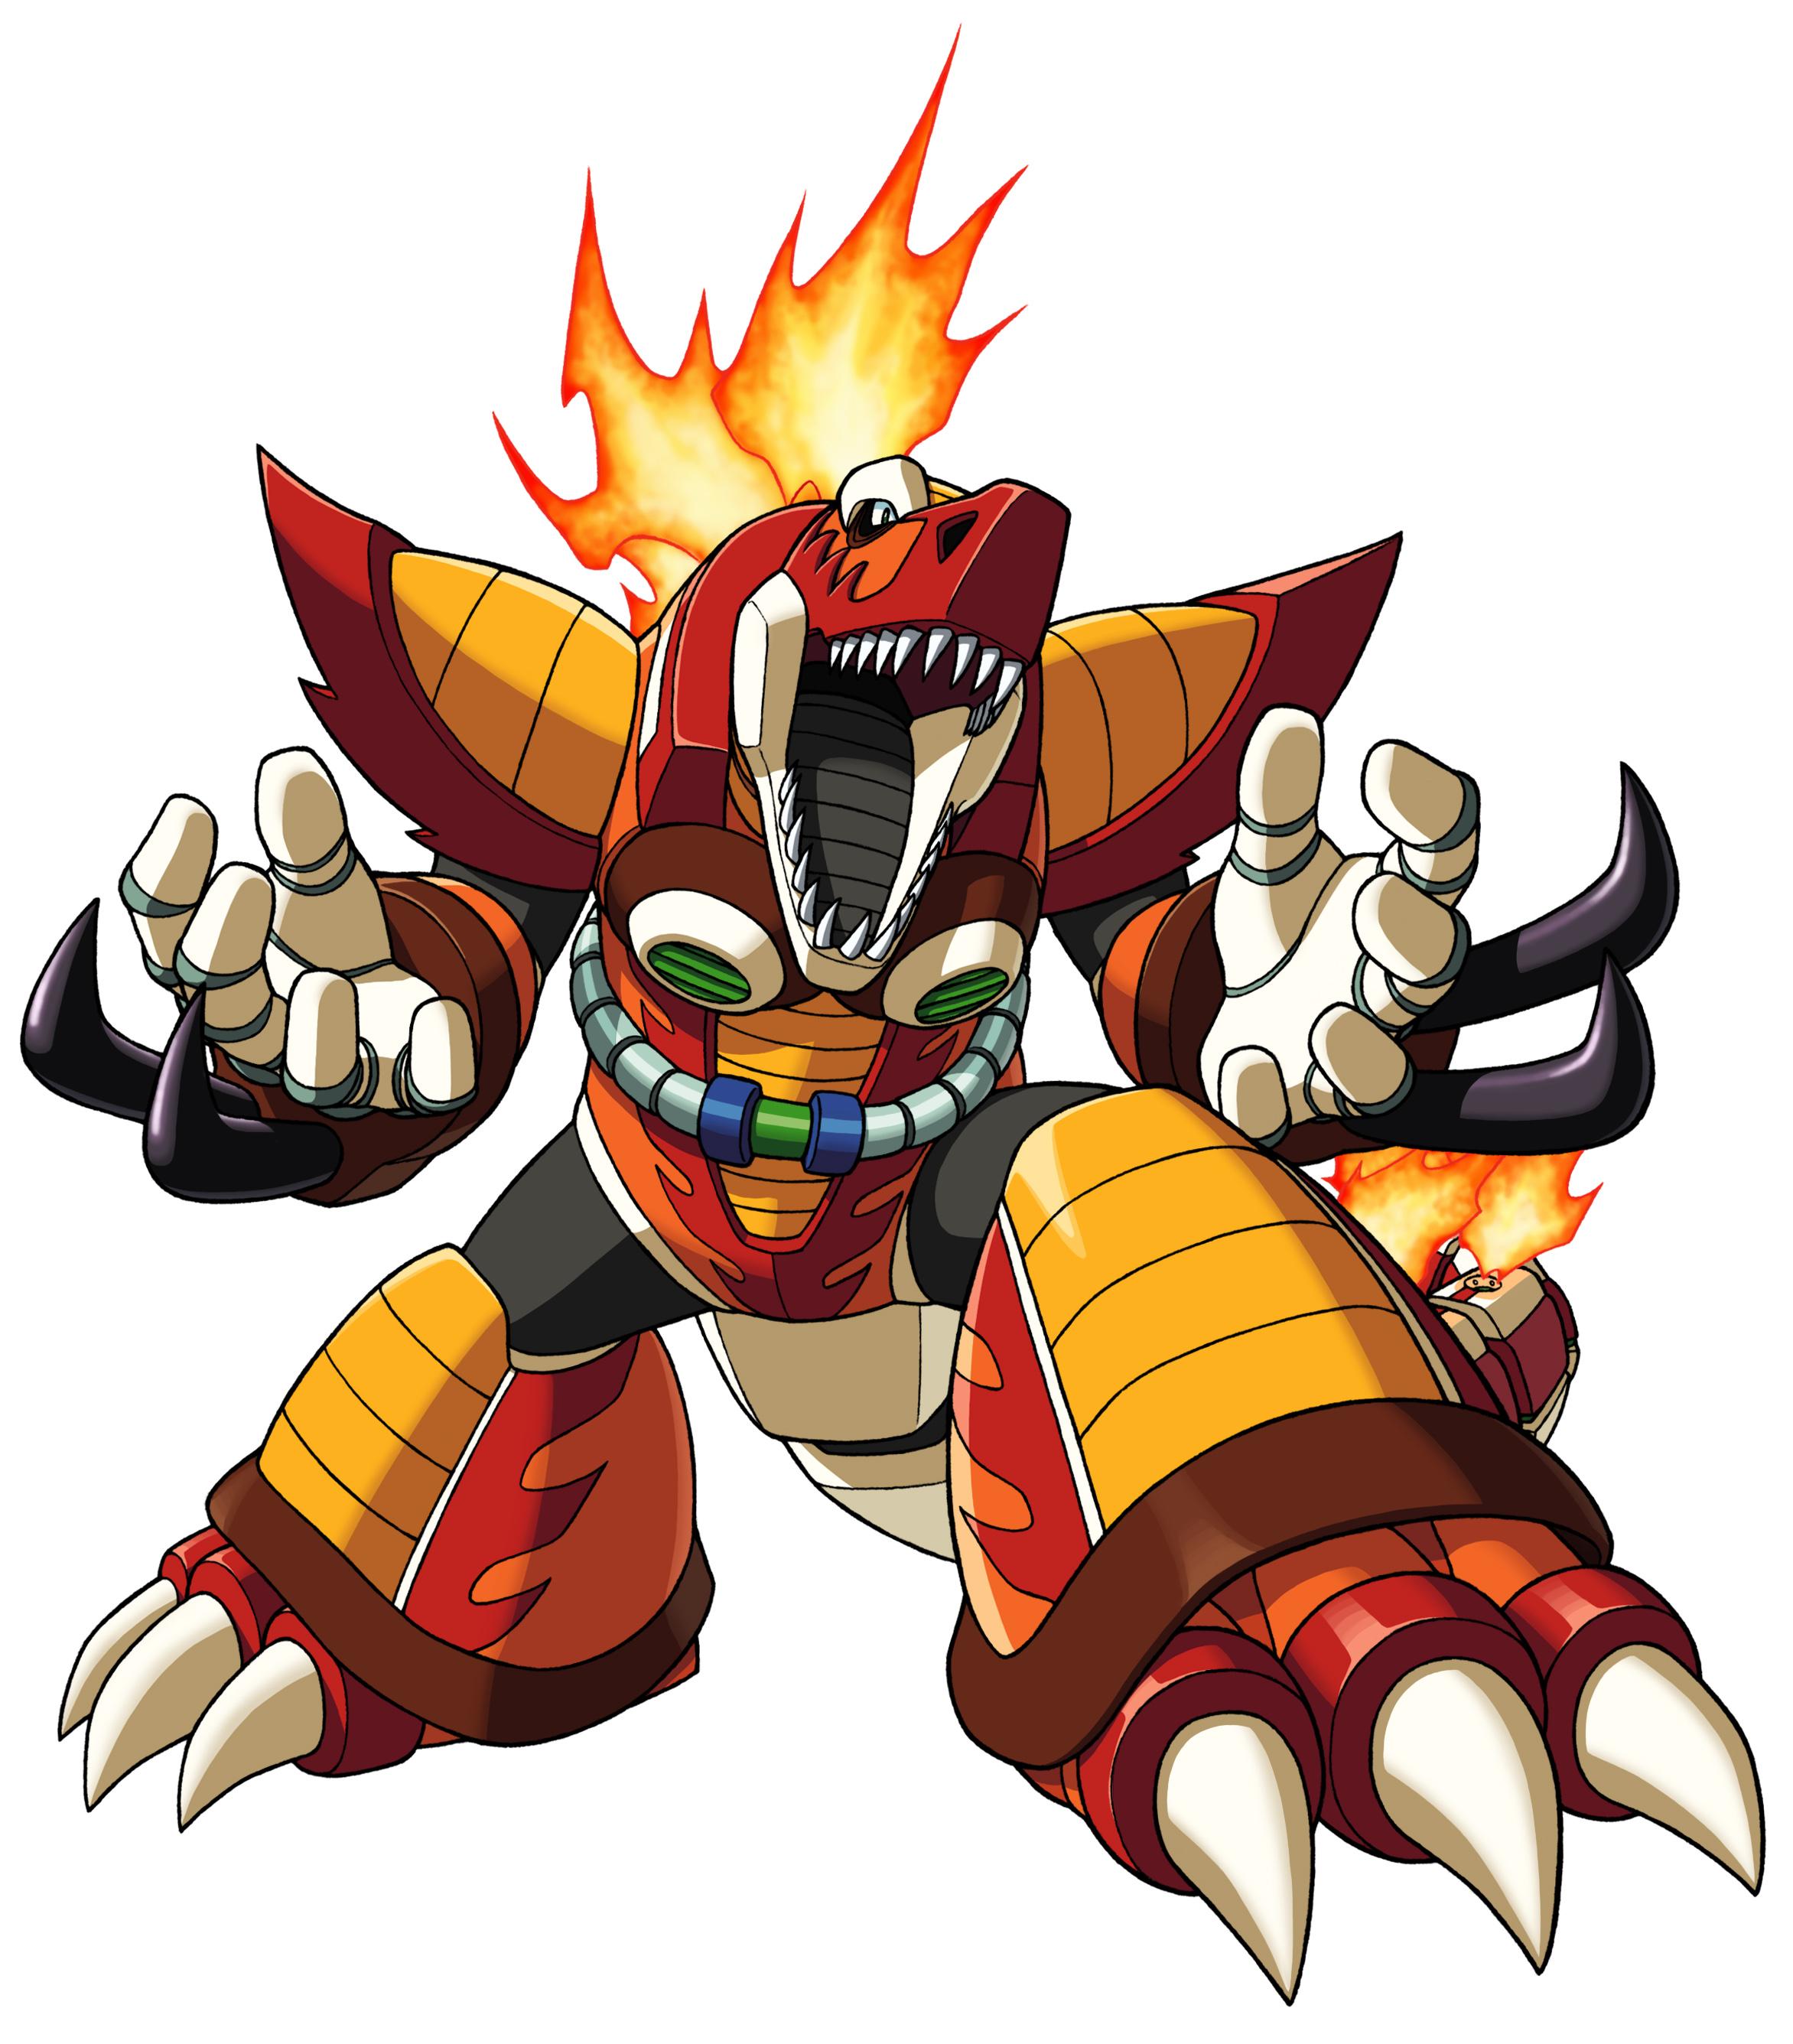 Mattrex mega man hq fandom powered by wikia - Megaman wikia ...